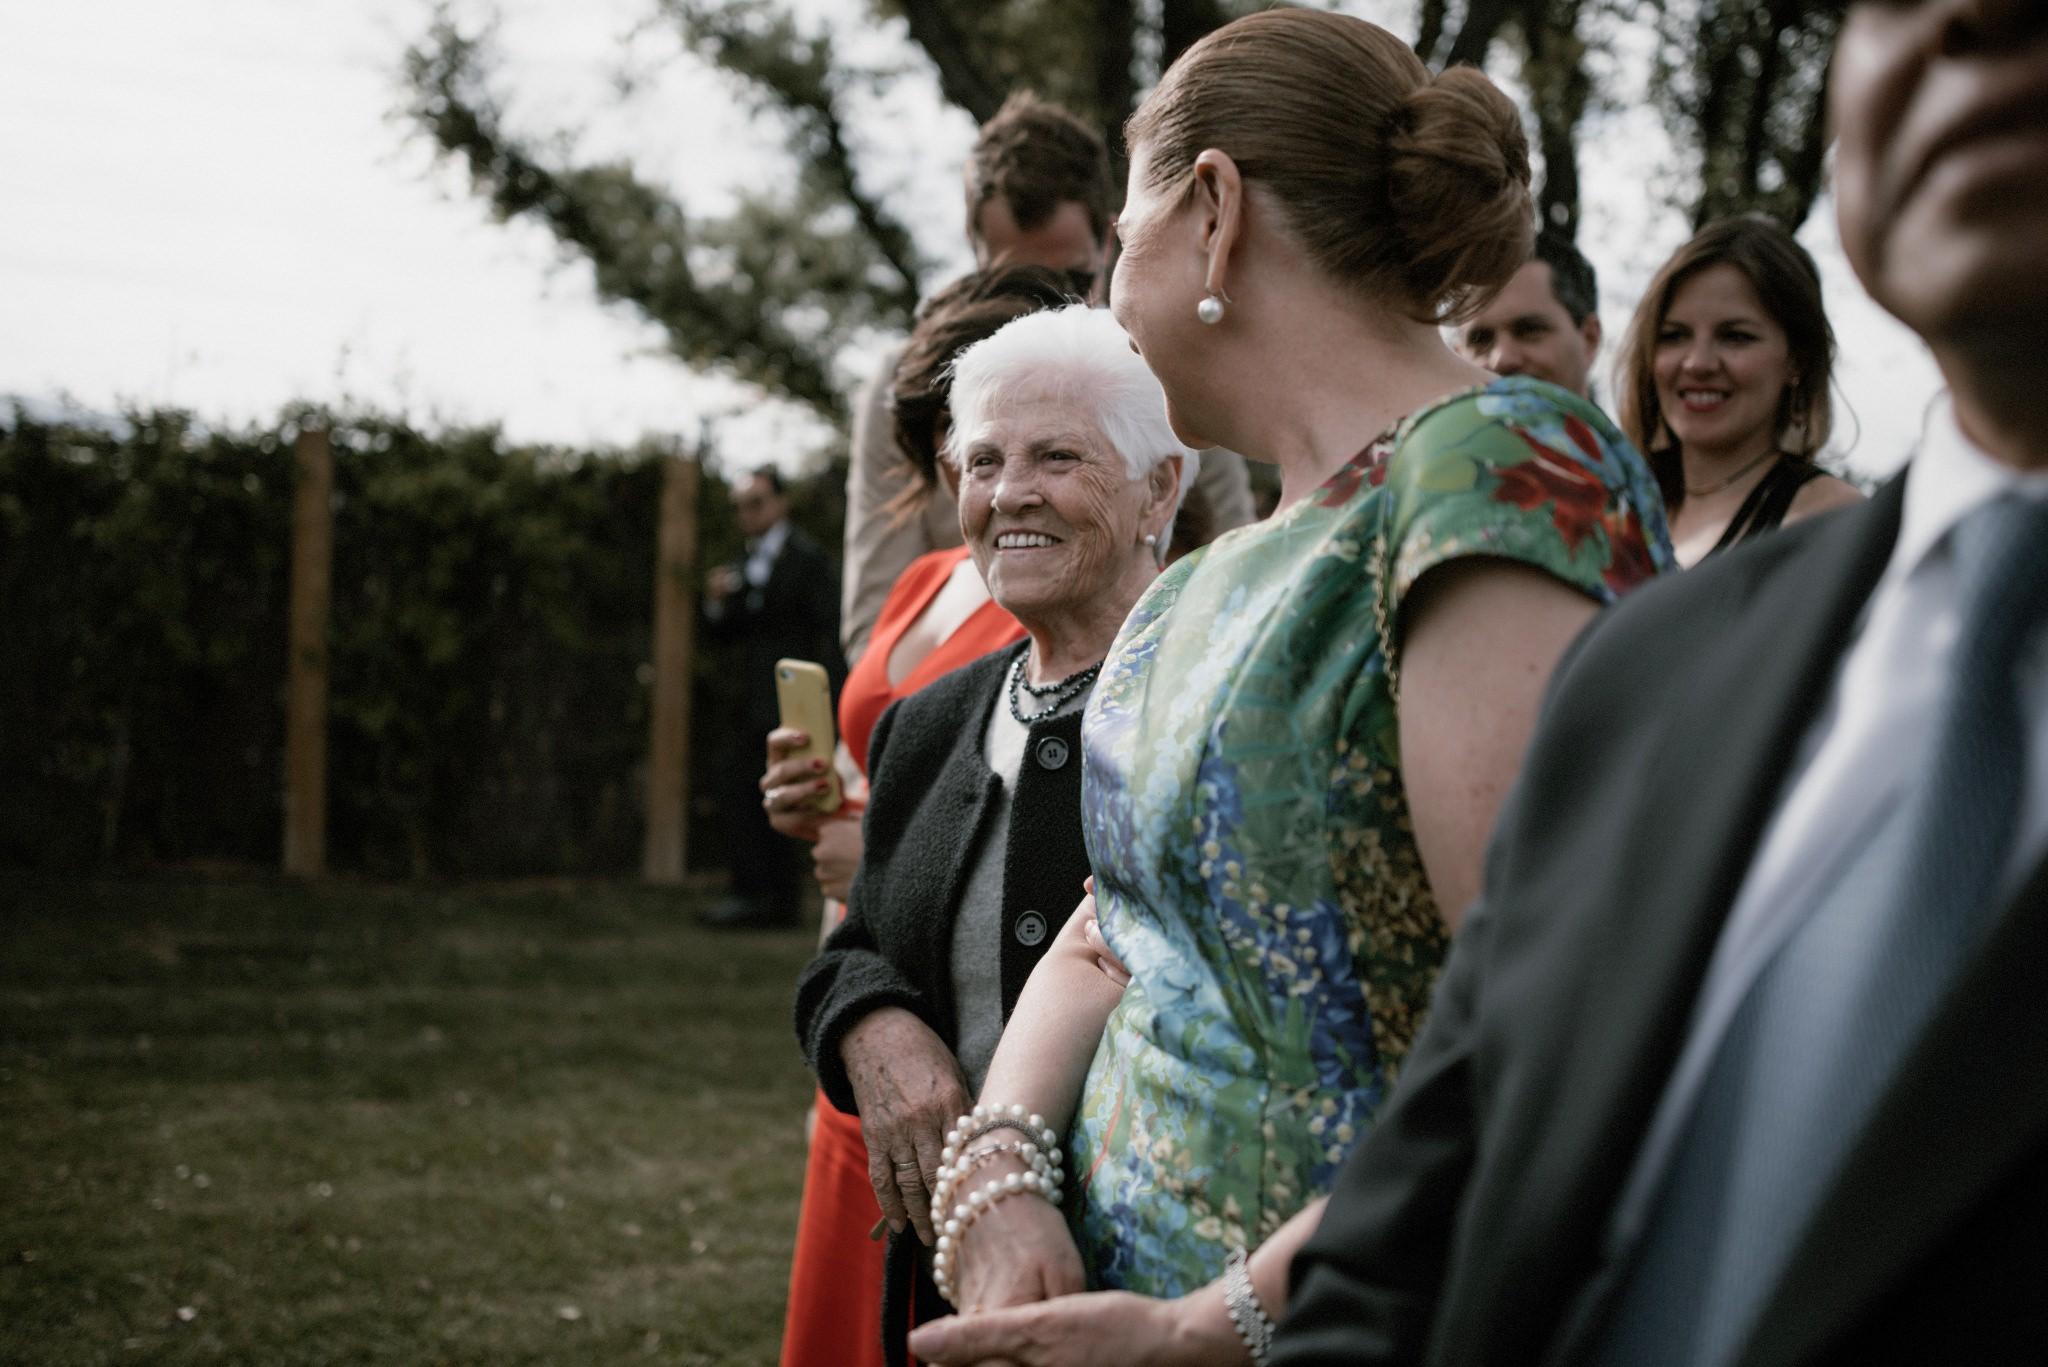 Bruidsfotograaf Spanje Castle d'Emporda destination wedding Naomi van der Kraan00040.jpg